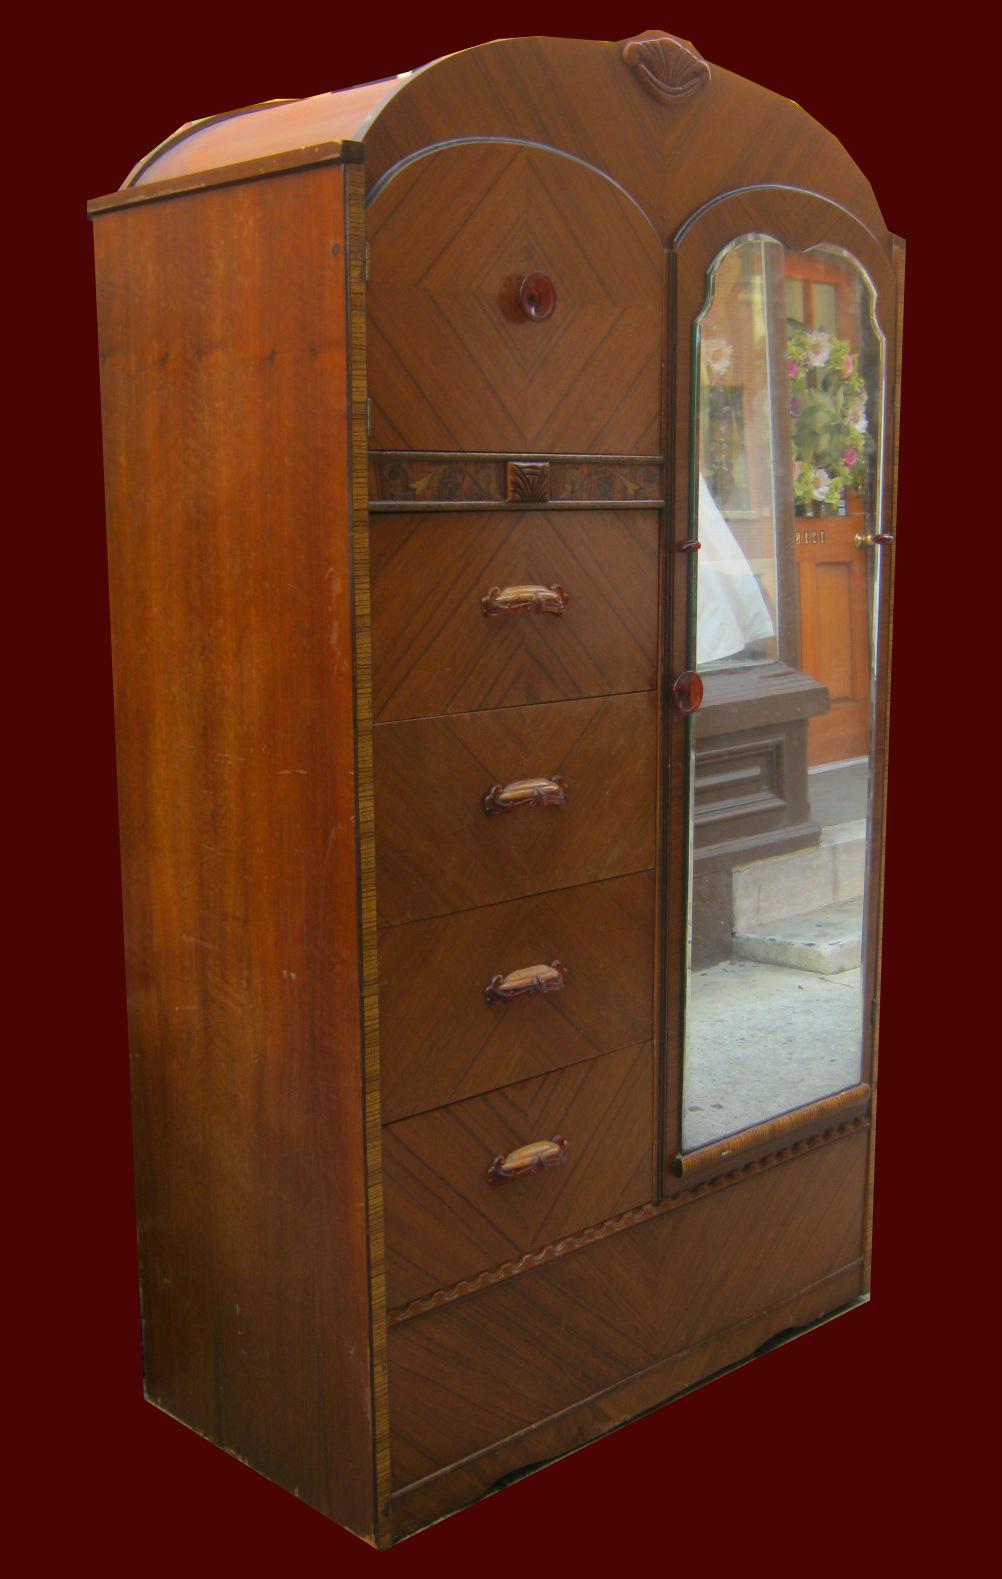 Uhuru Furniture & Collectibles: 1930s Waterfall Bedroom